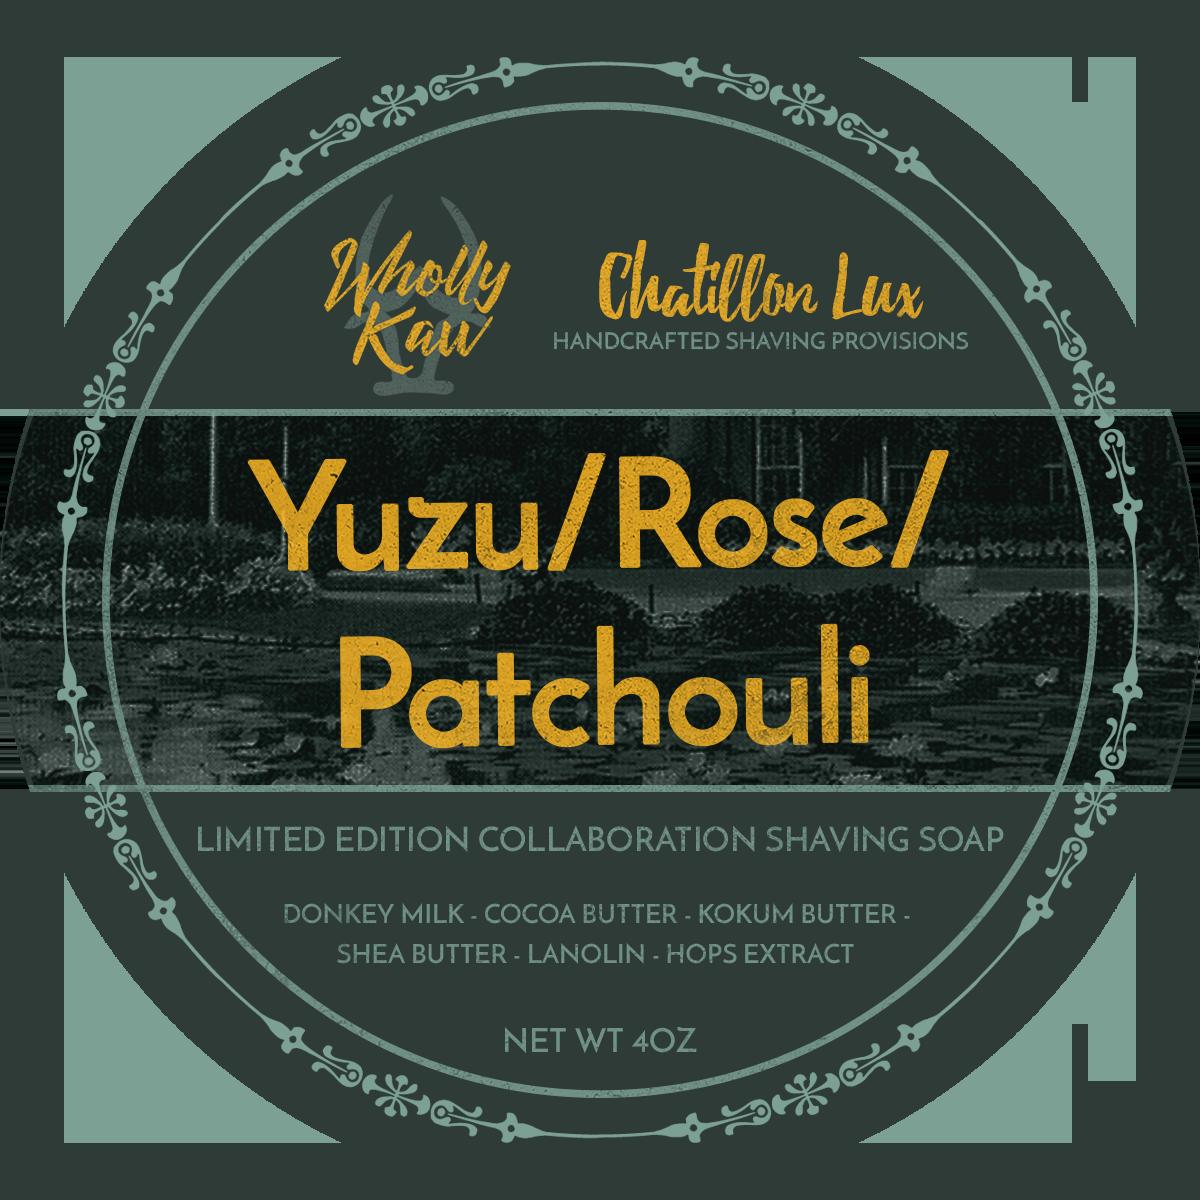 Chatillon Lux/Wholly Kaw - Yuzu/Rose/Patchouli - Soap (LE) image